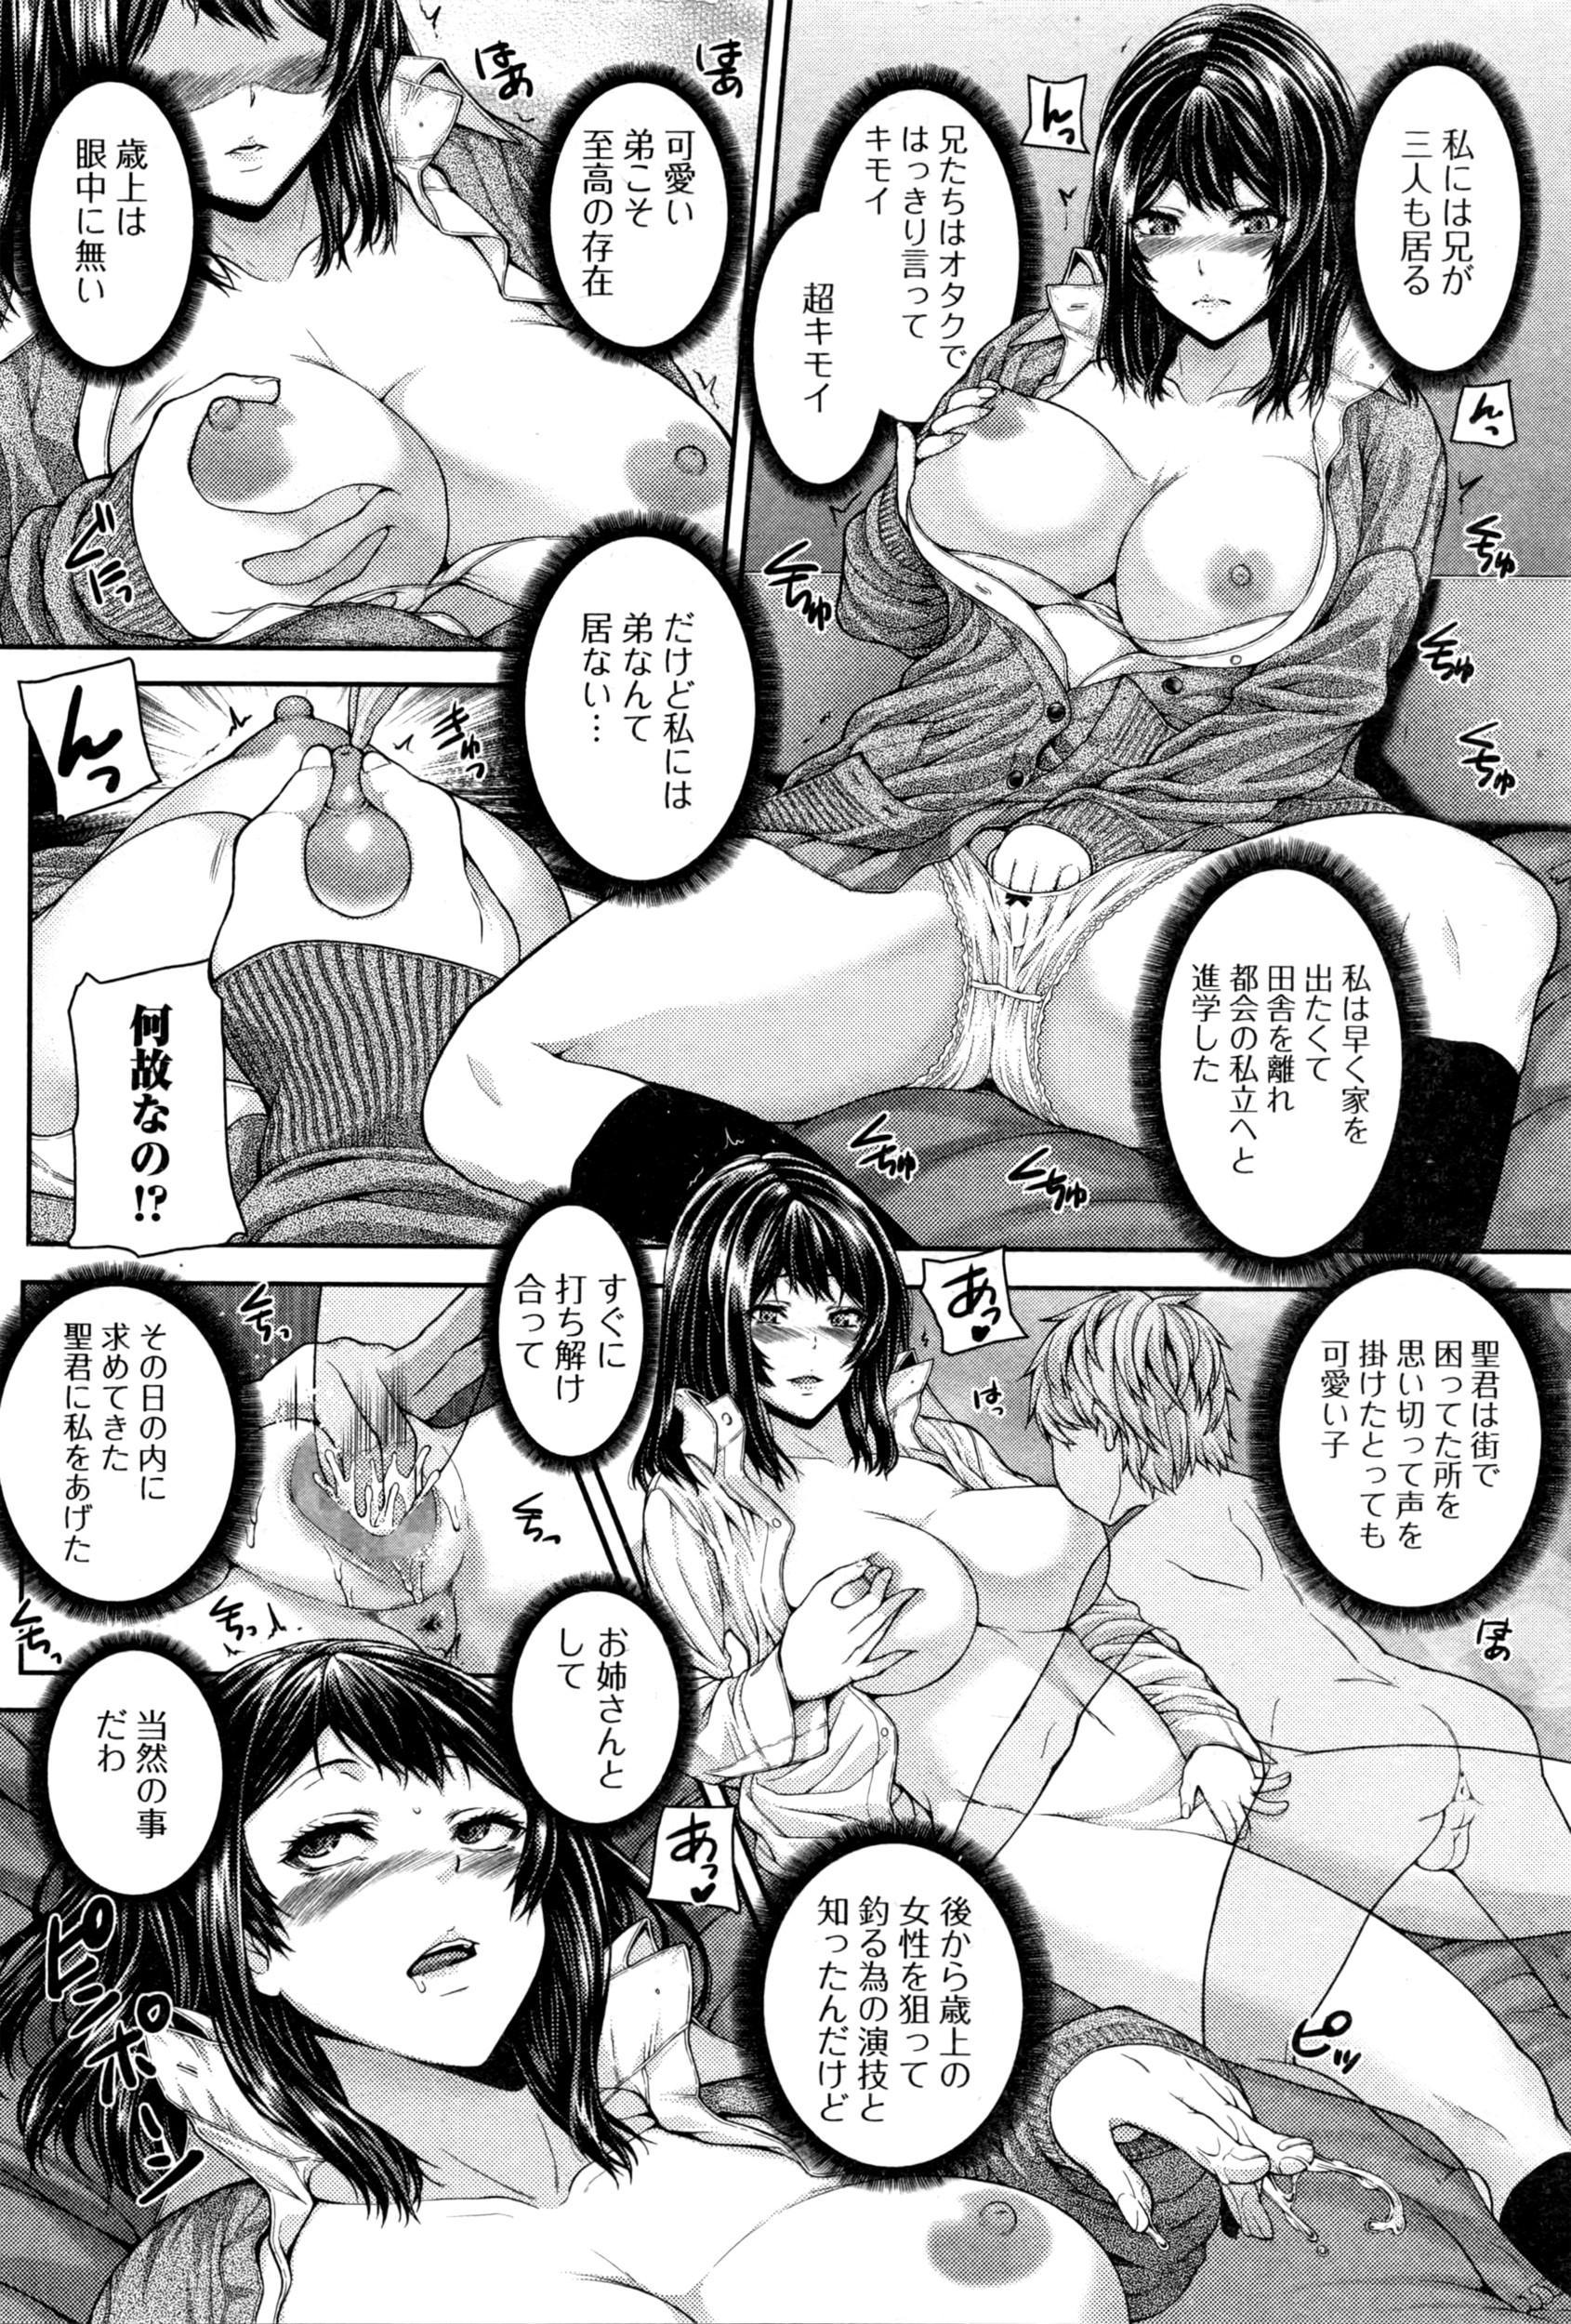 Comic JSCK Vol.3 2016-03 92